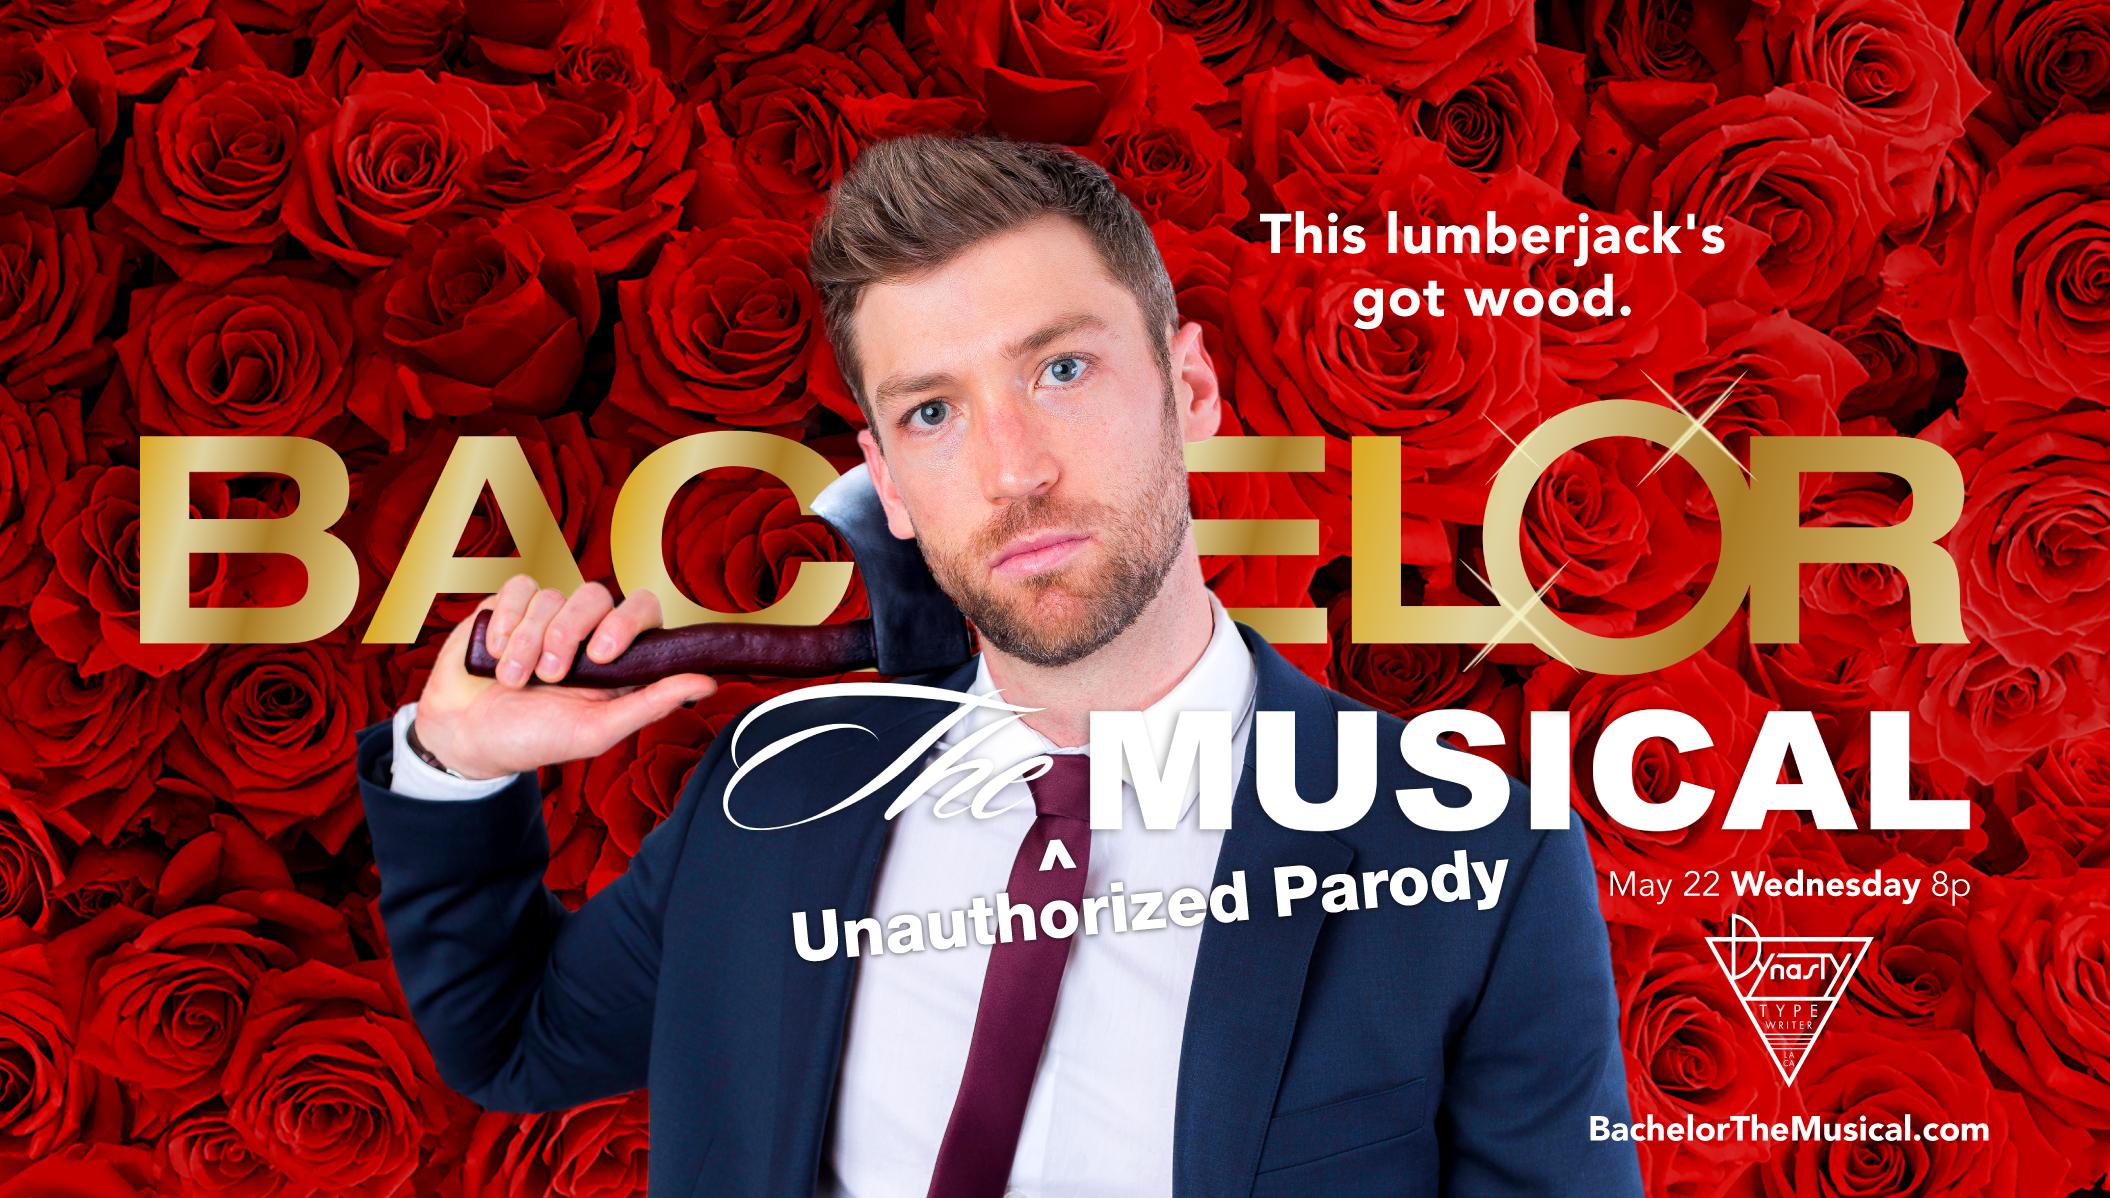 bachelor-unauthorized-banner.jpg